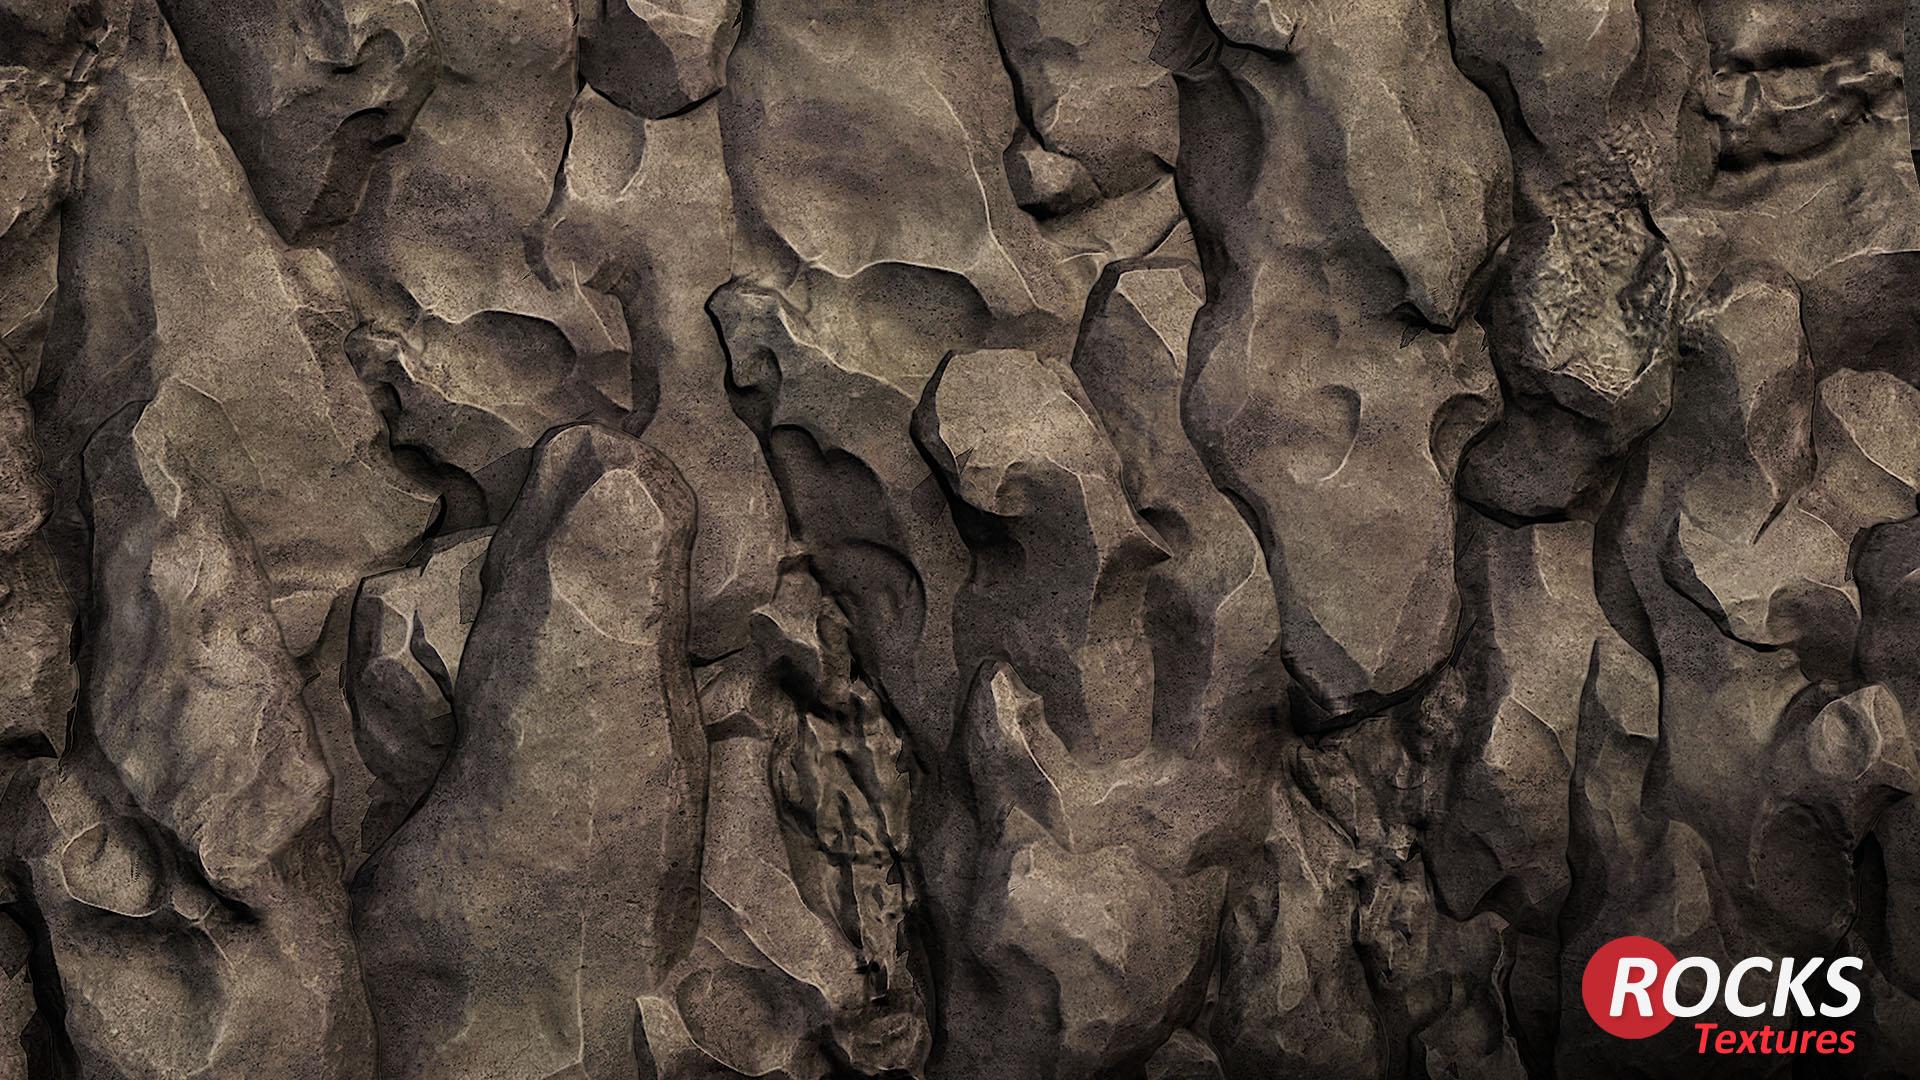 rock_stone_sculpted_textures_02.jpg